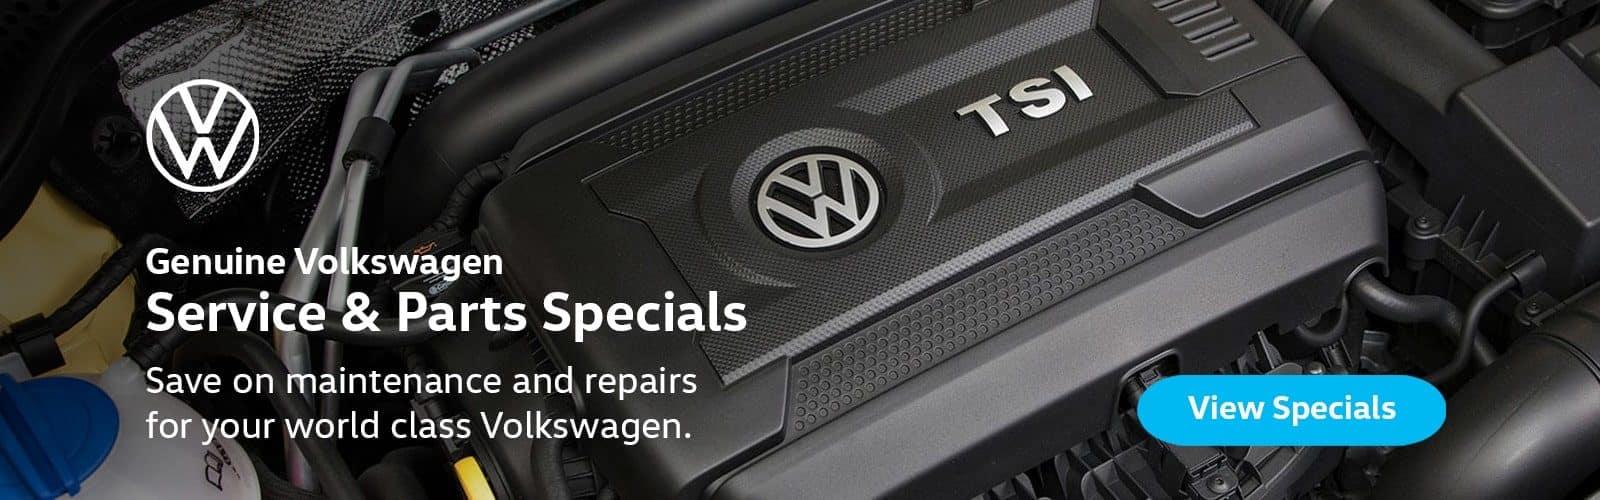 vw-service-homepage-banner-1600×500-min